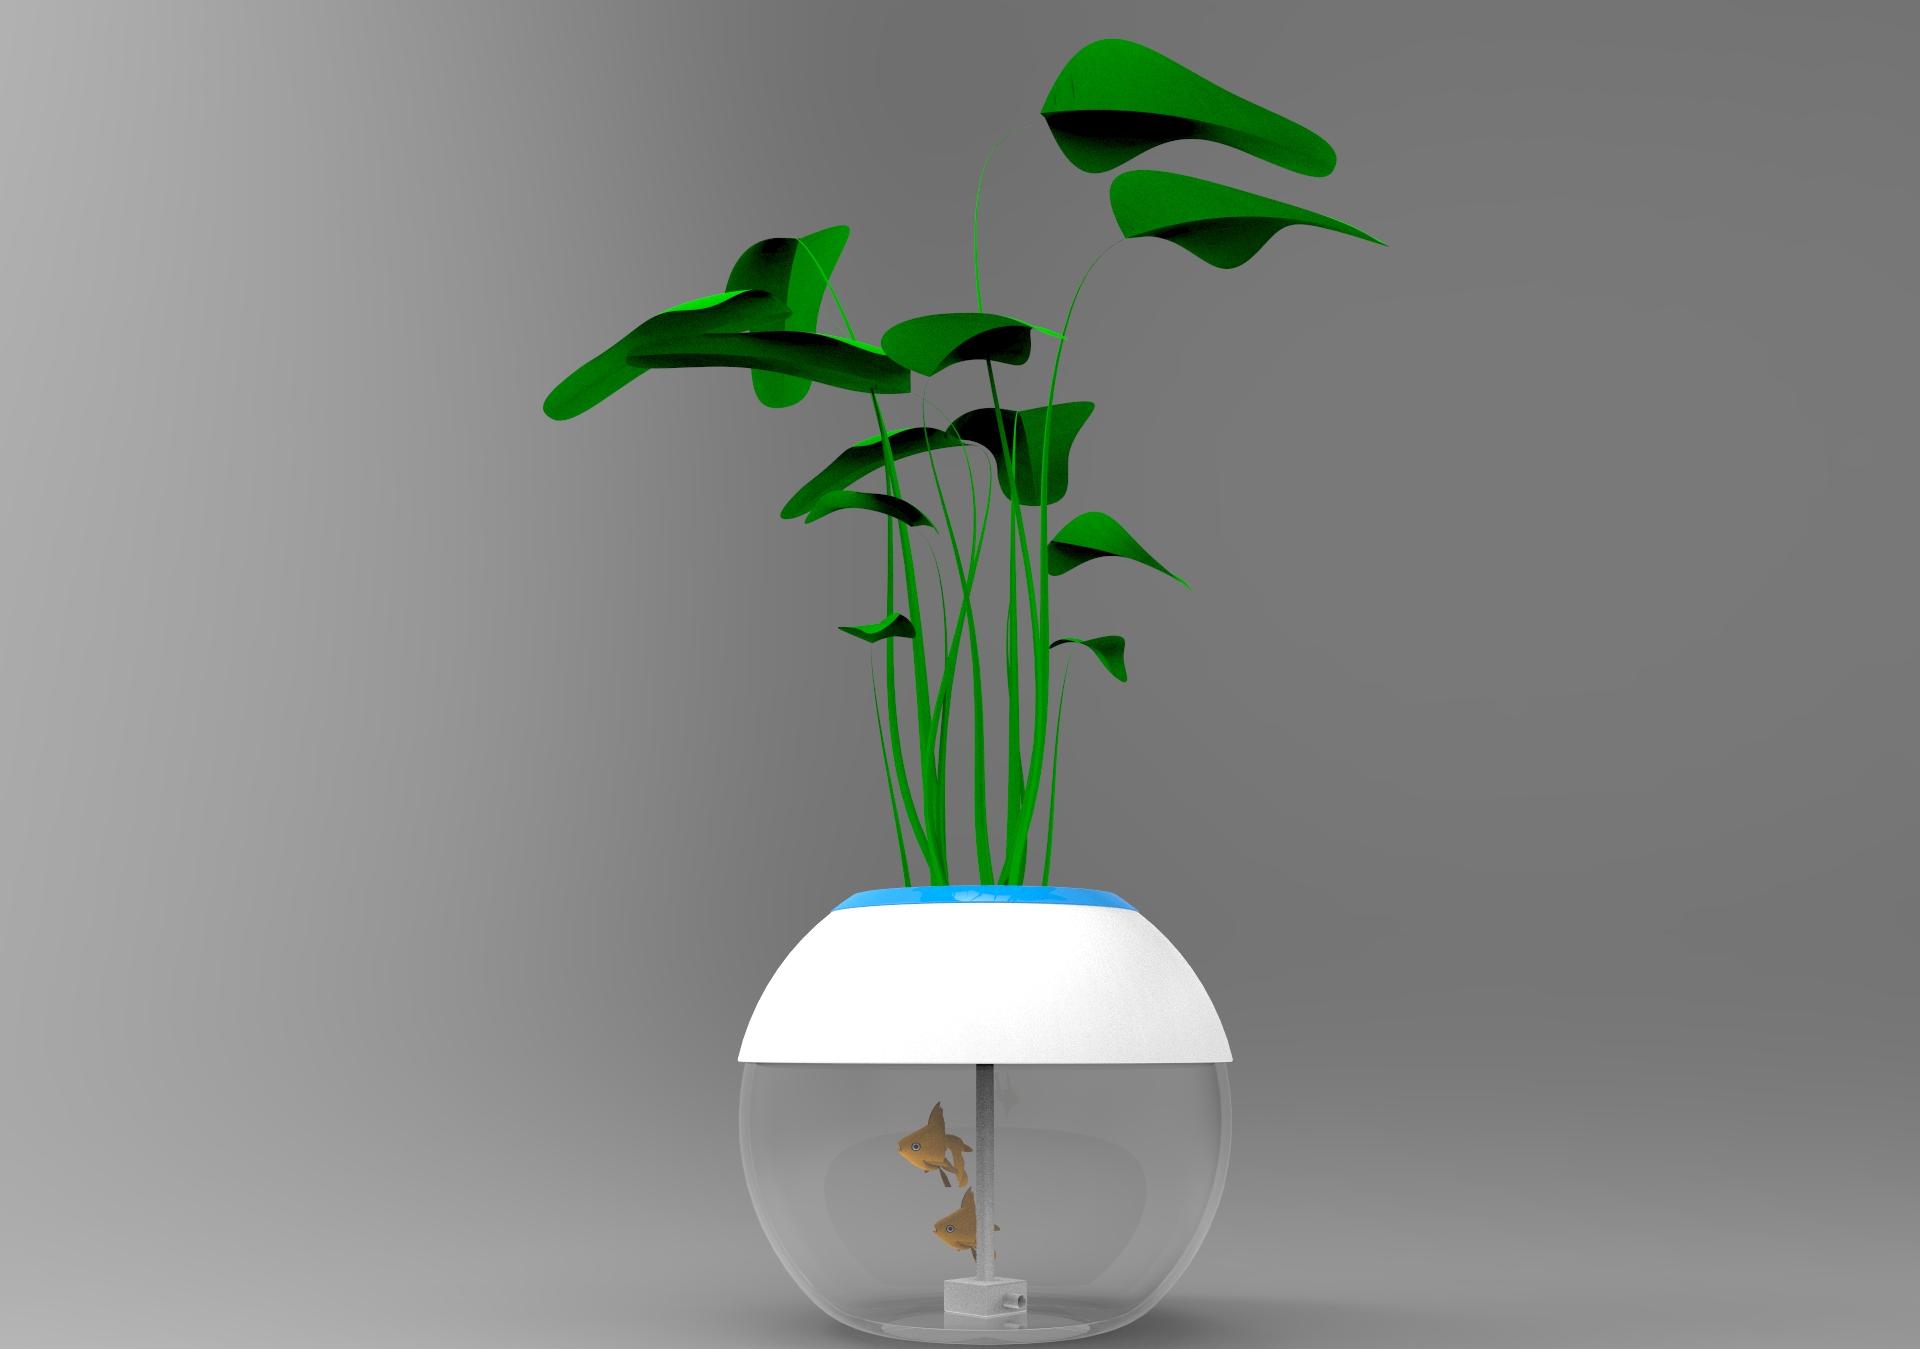 Picture of Aquaponics System